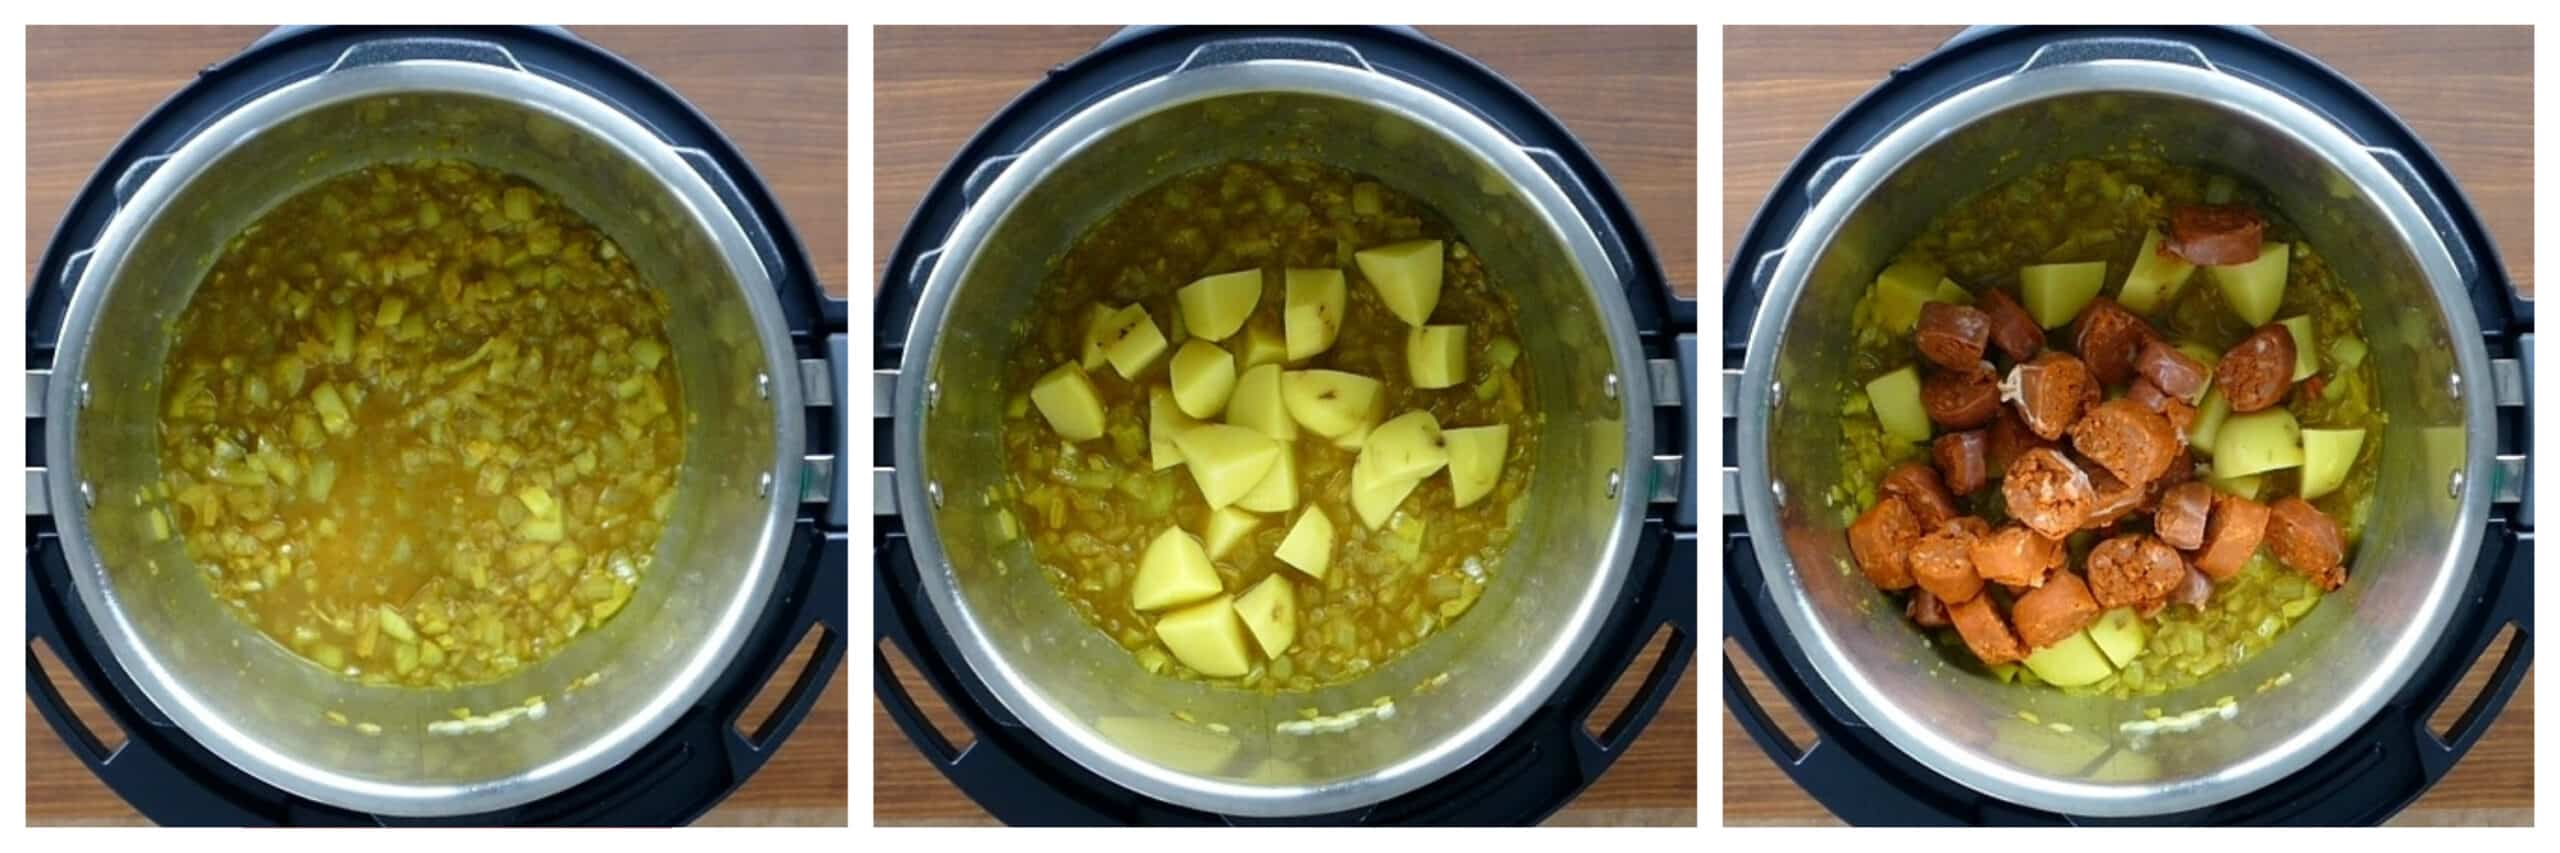 Instant Pot Chorizo and Potato Instructions 3 collage - broth added, potatoes added, sliced chorizo added